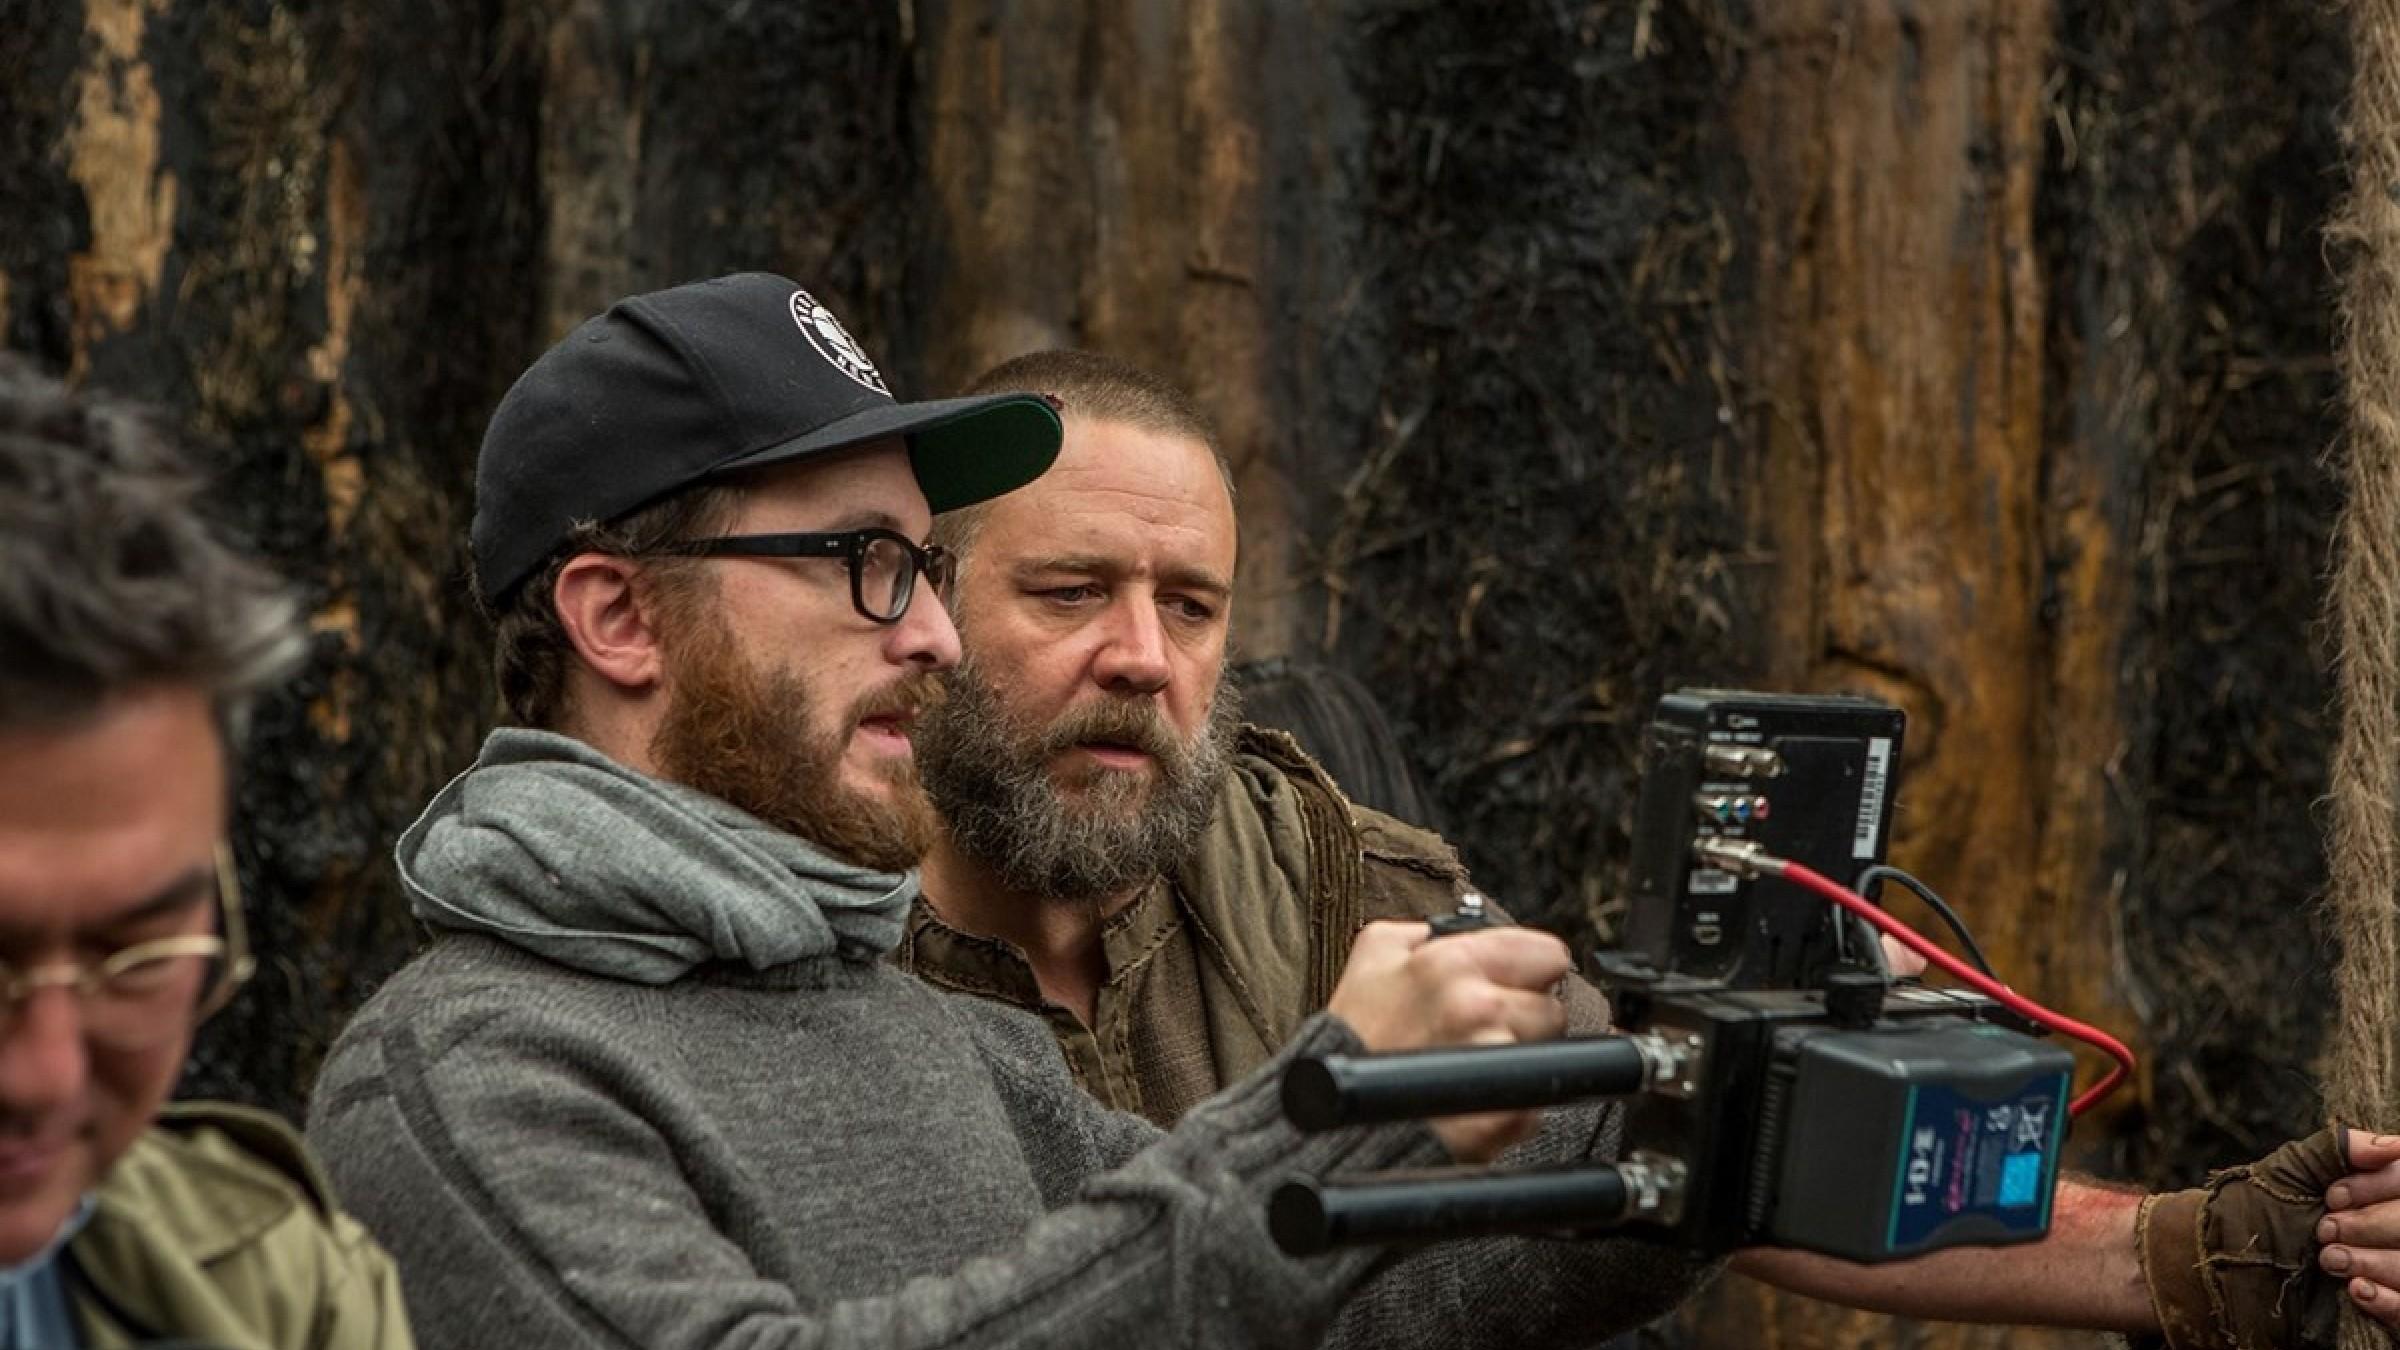 Darren Aronofsky 2 - دارن آرونوفسکی | سینما، بیوگرافی و فیلم هایش